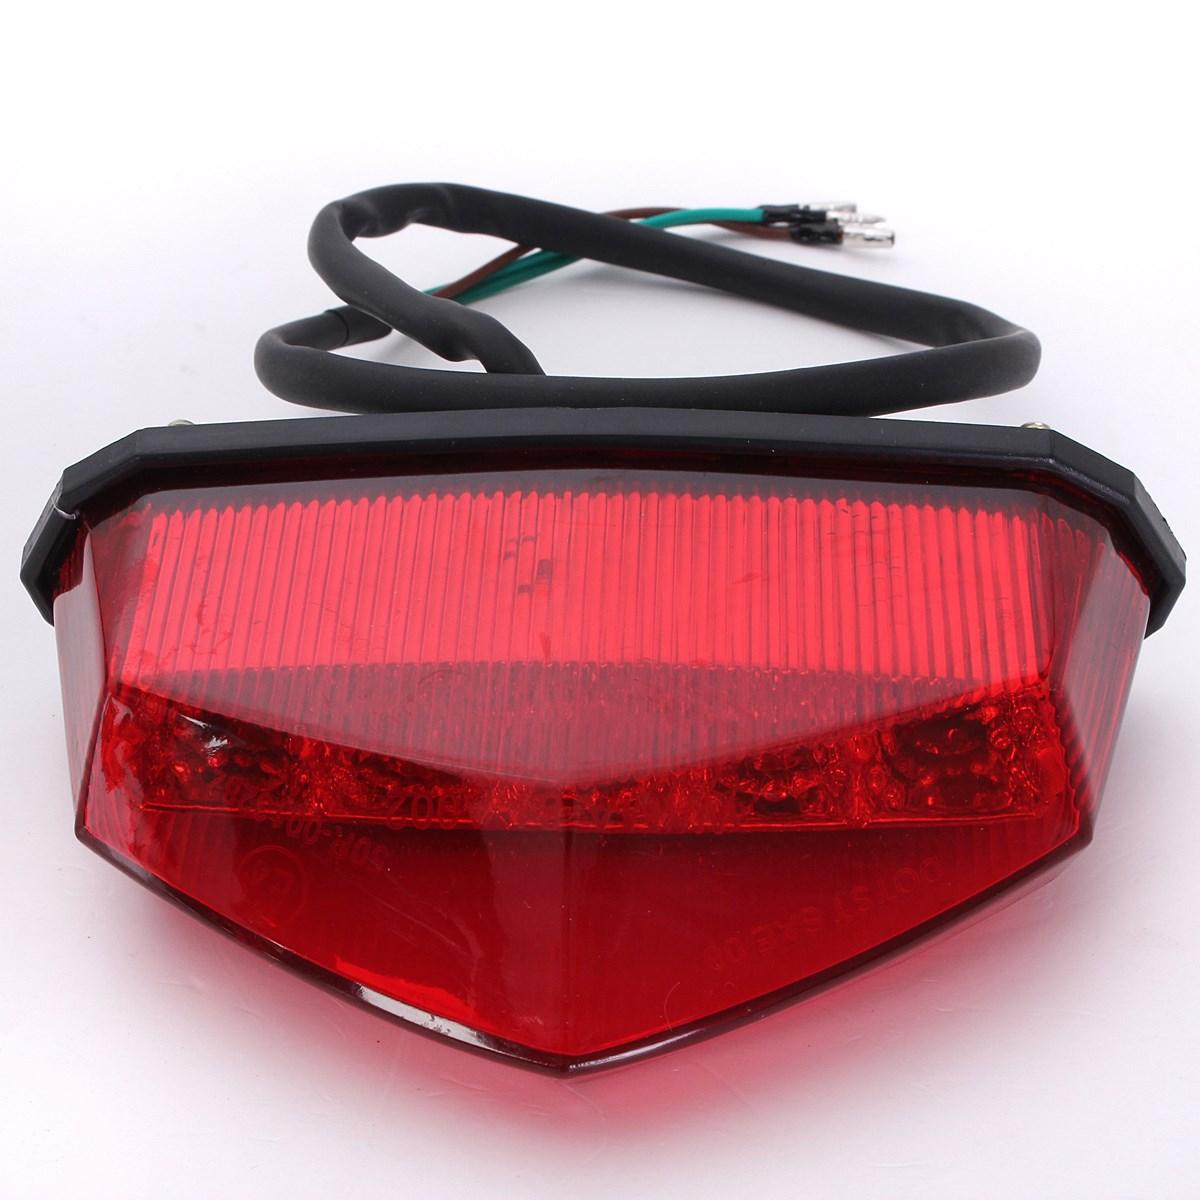 Audew 12V 3 Wiring Universal 10LEDs Red Motorcycle Dirt Bike Plate Lamp Rear Tail Brake Light